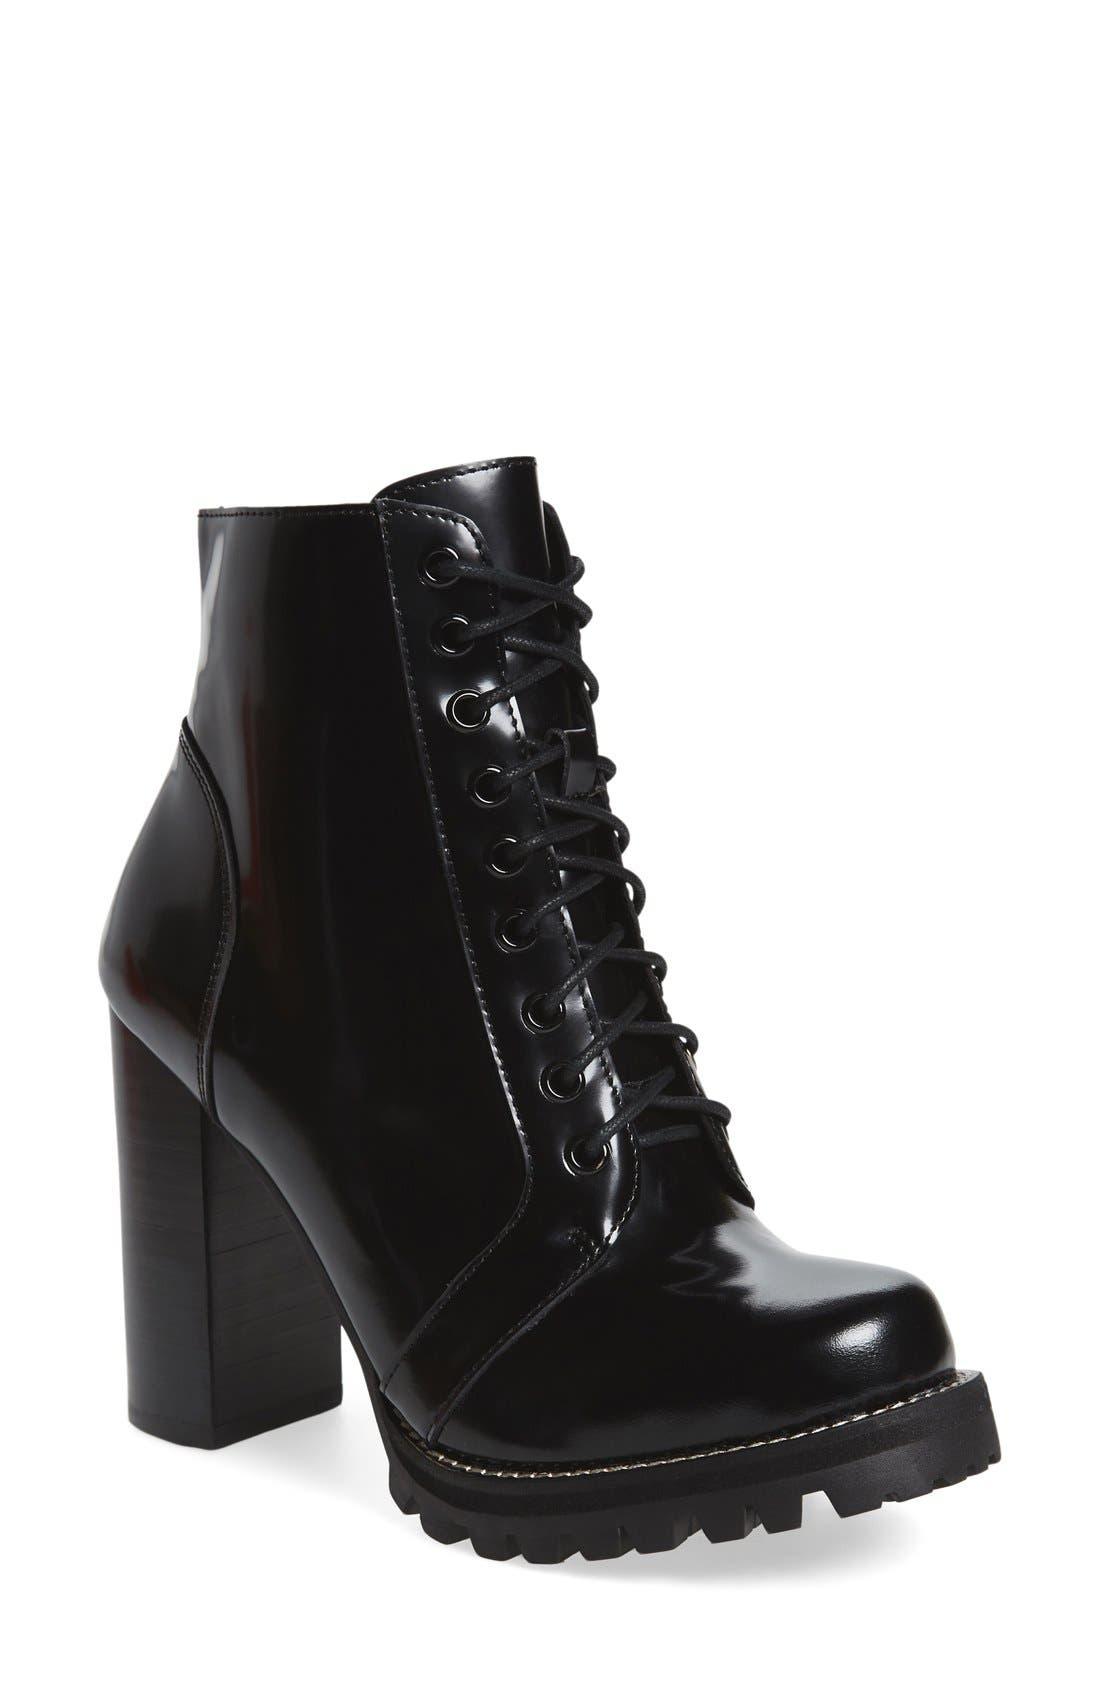 Alternate Image 1 Selected - Jeffrey Campbell 'Legion' High Heel Boot (Women)